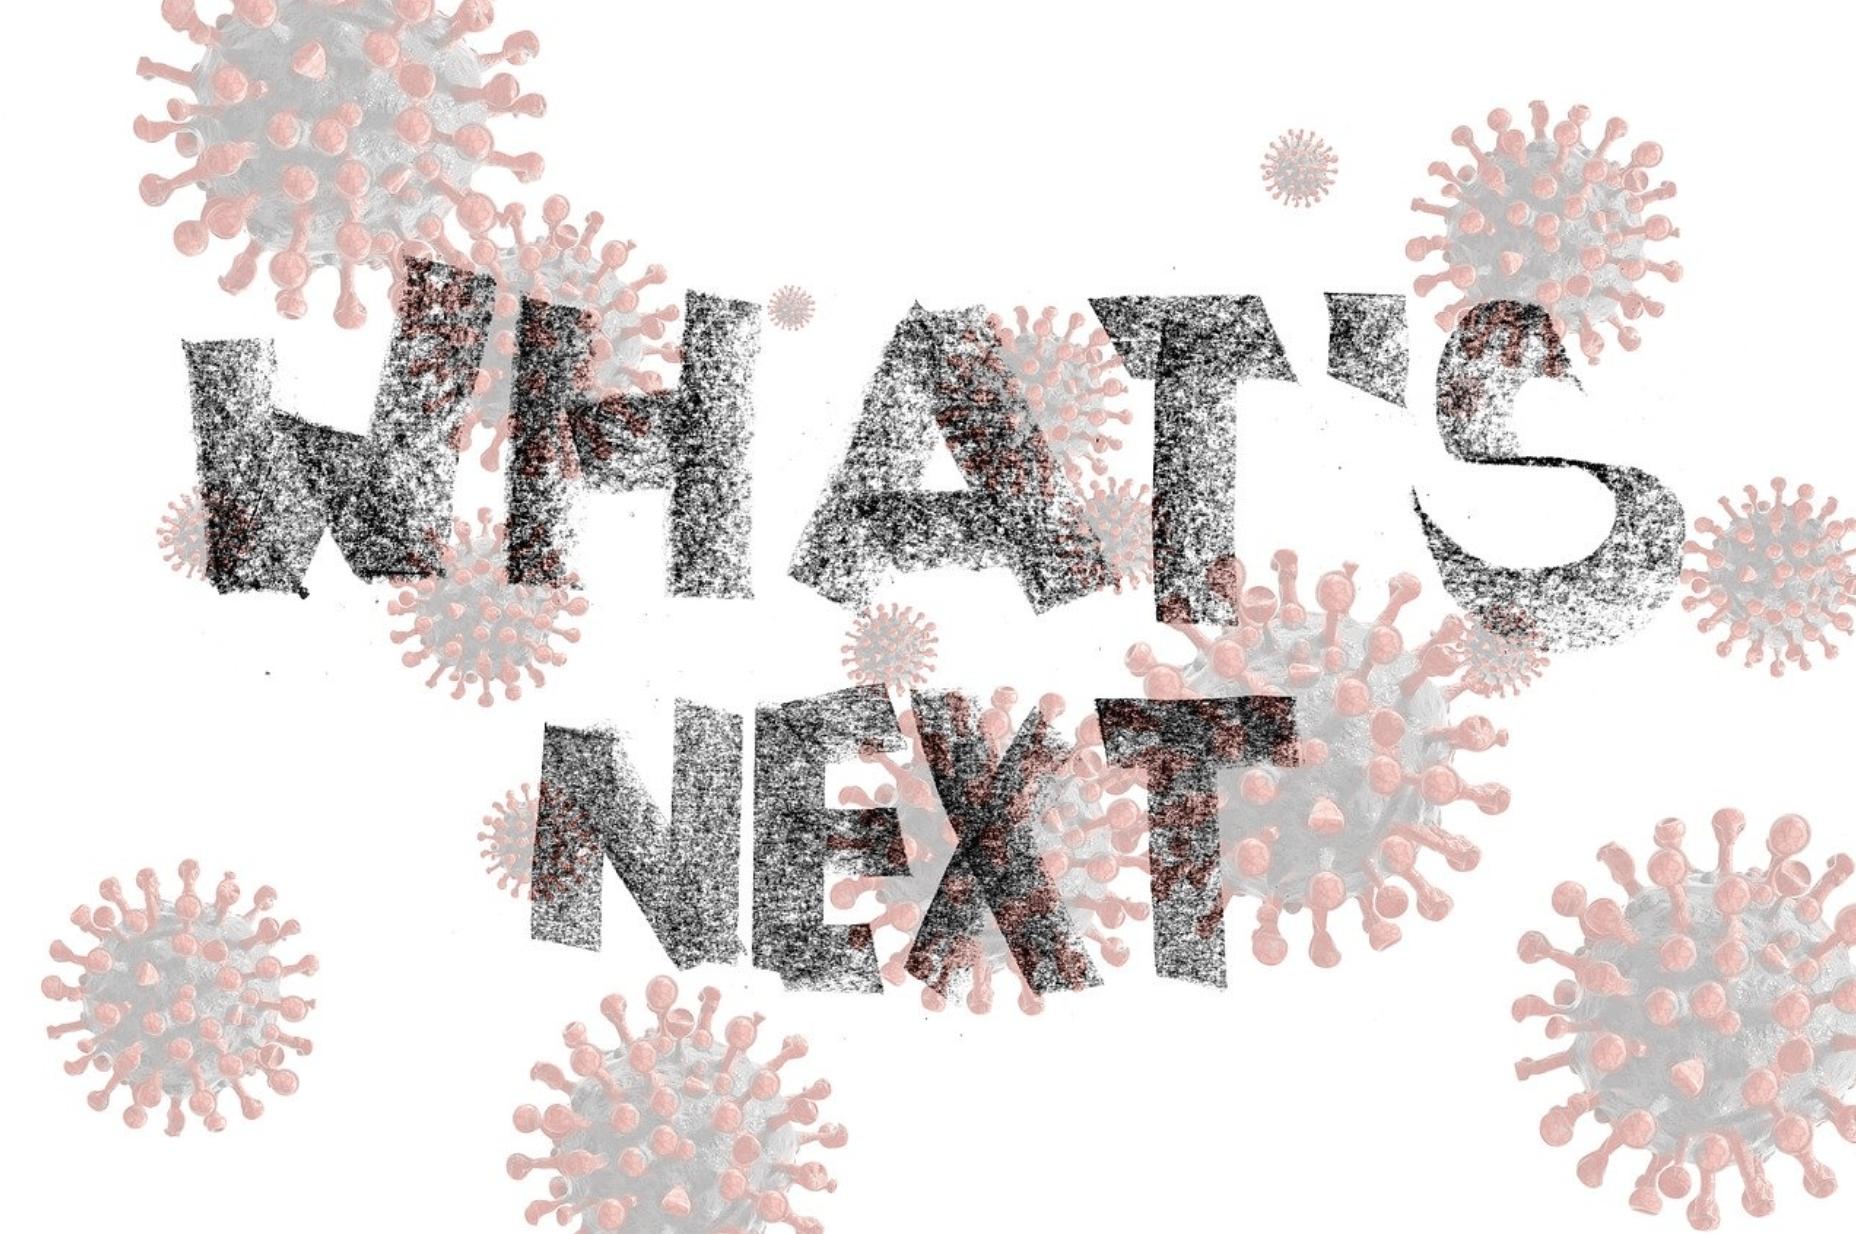 What's next na de coronacrisis?